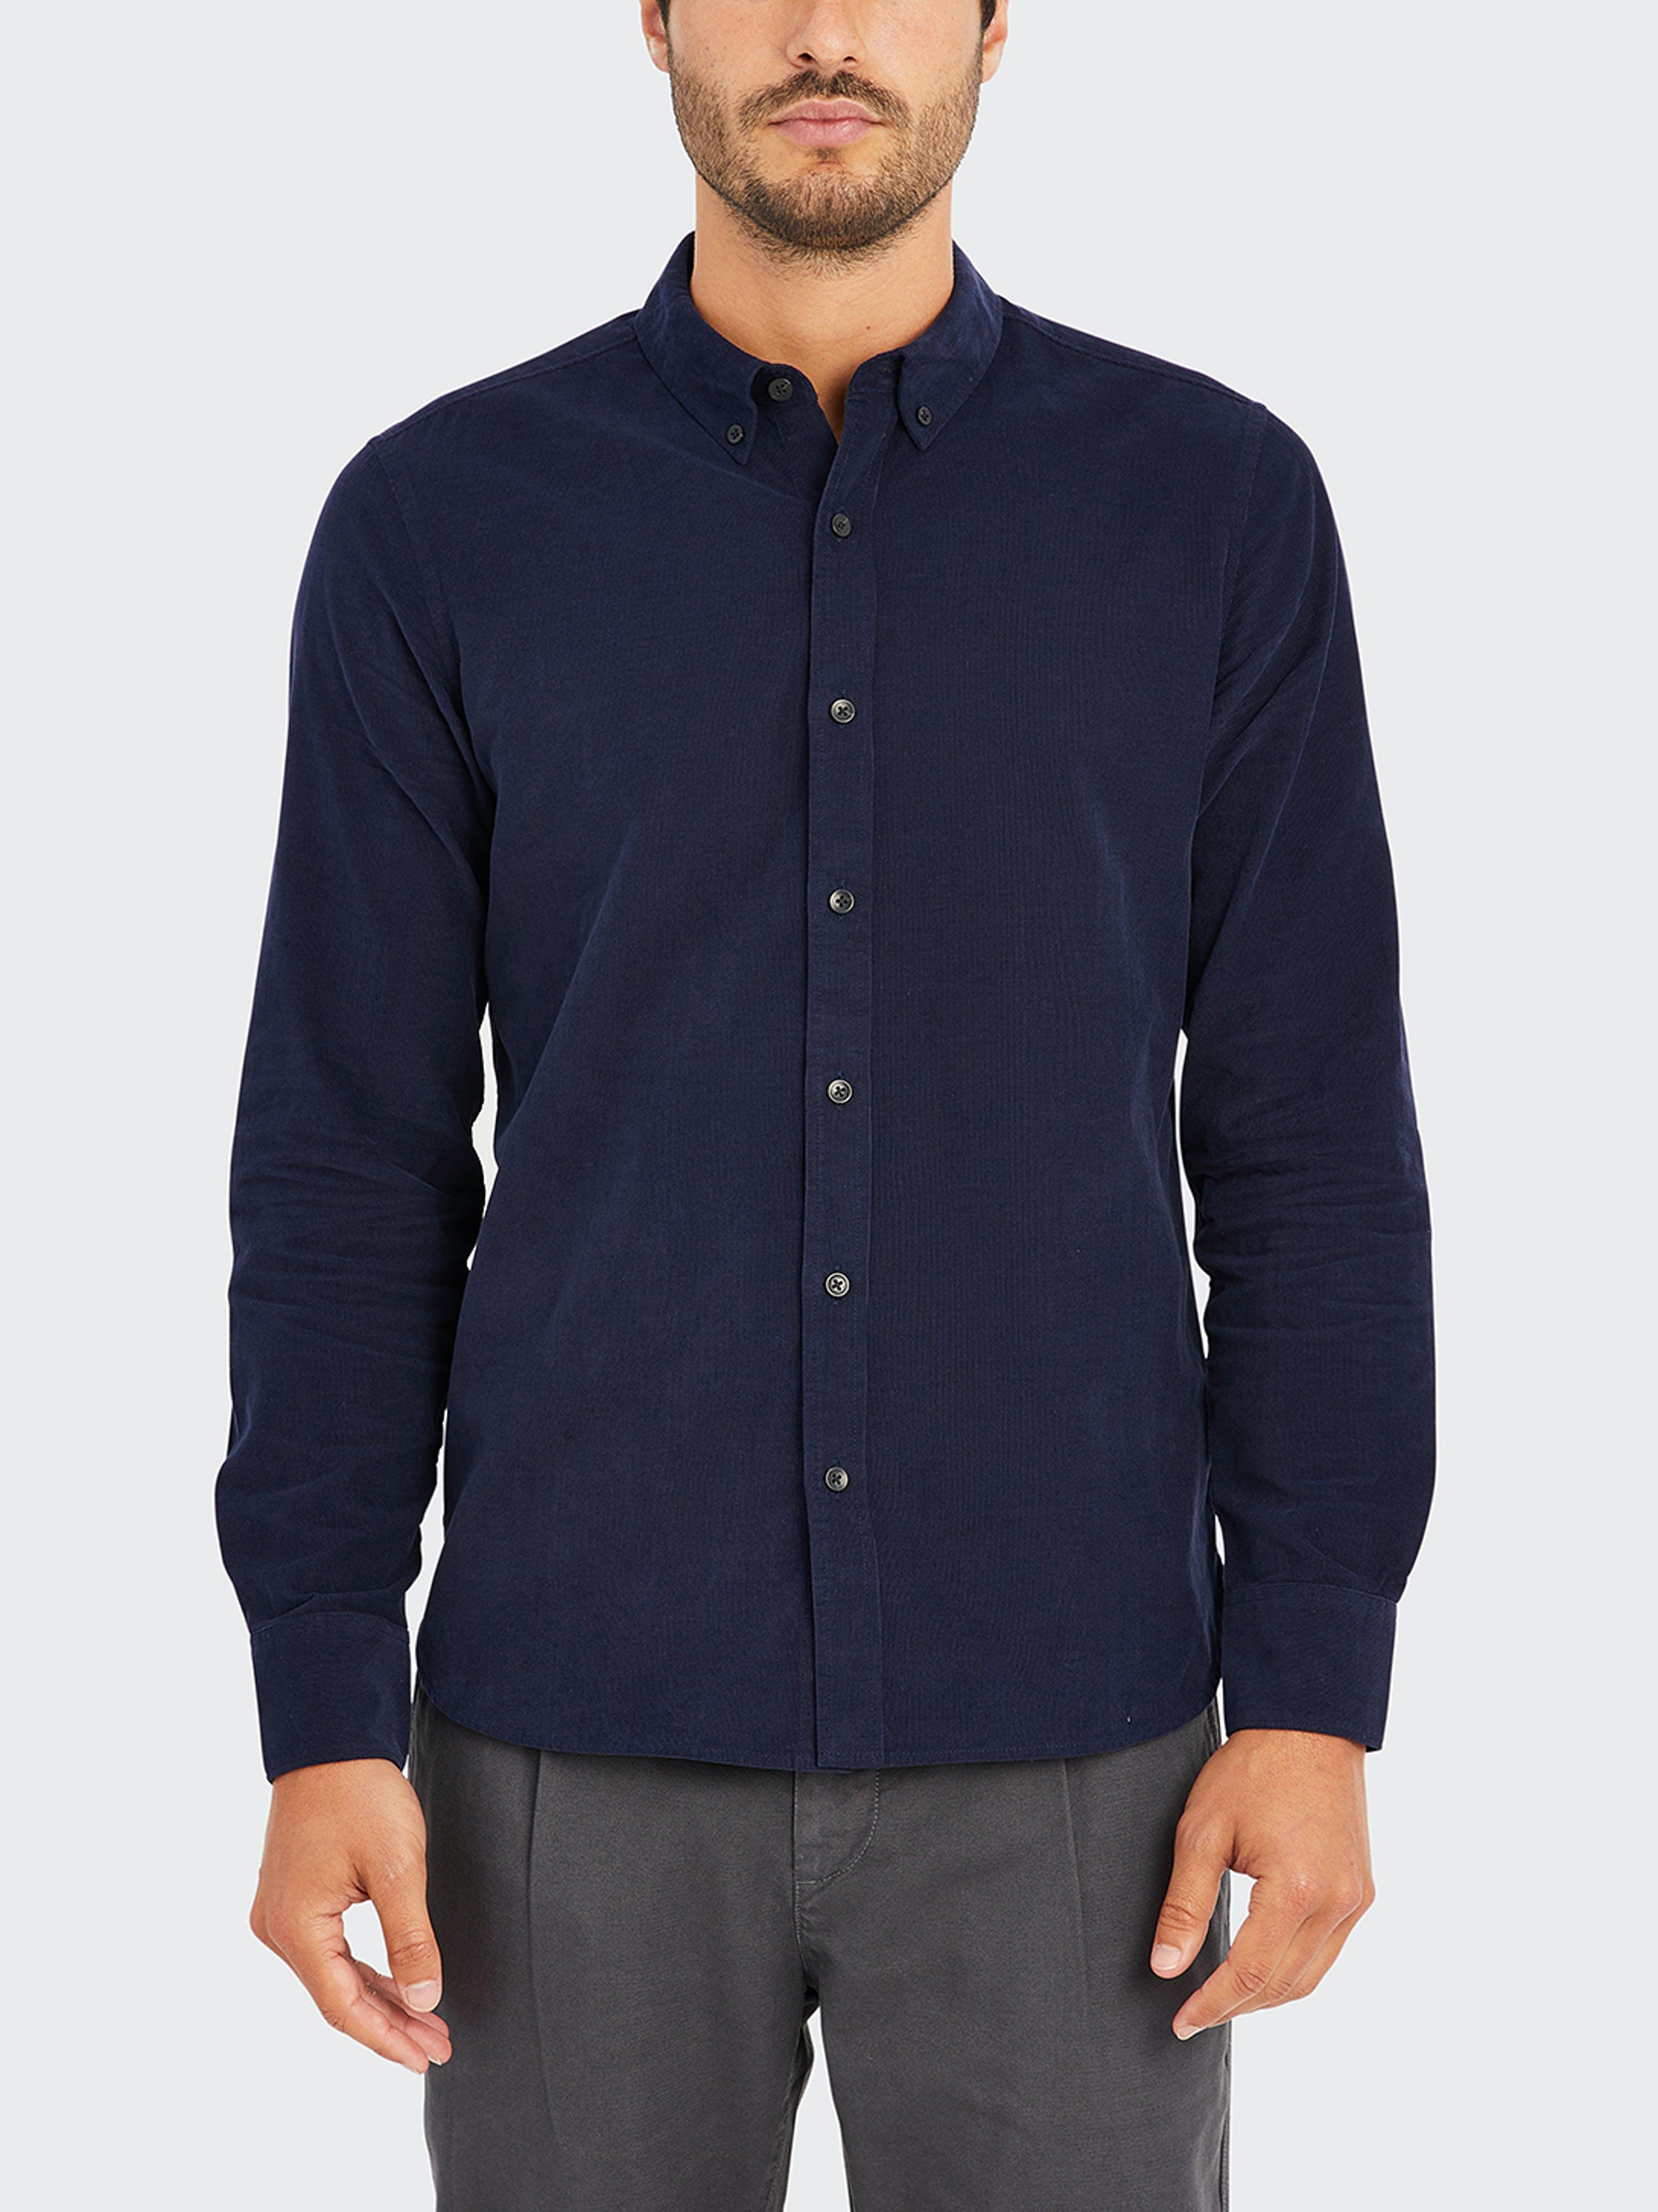 ONS Clothing Fulton Cord Shirt  - Blue